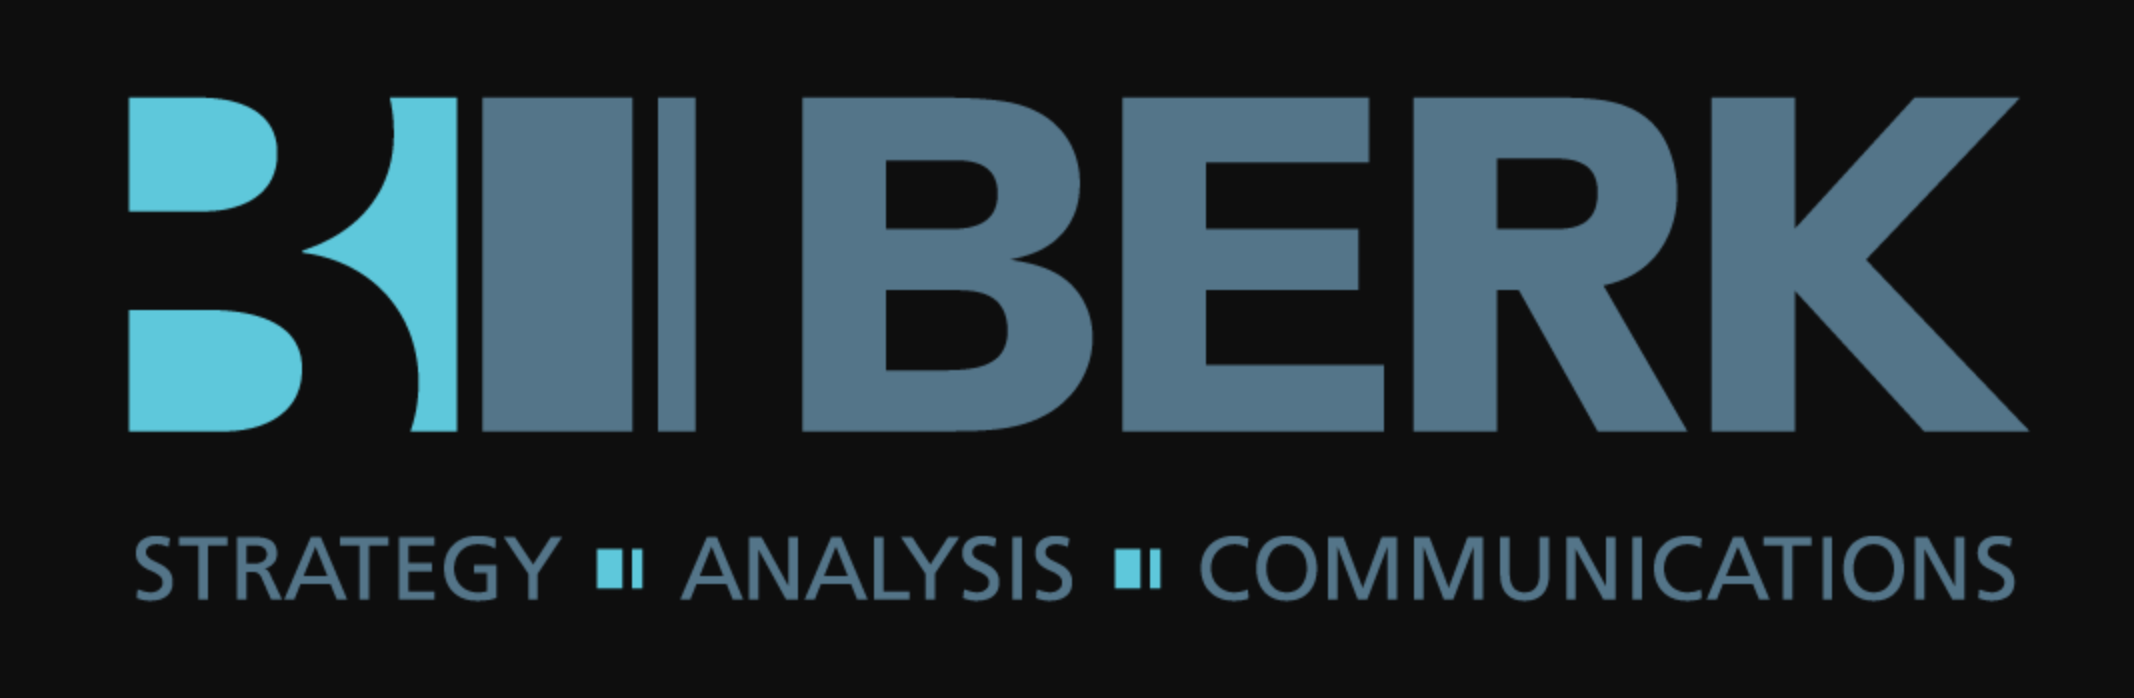 BERK Consulting